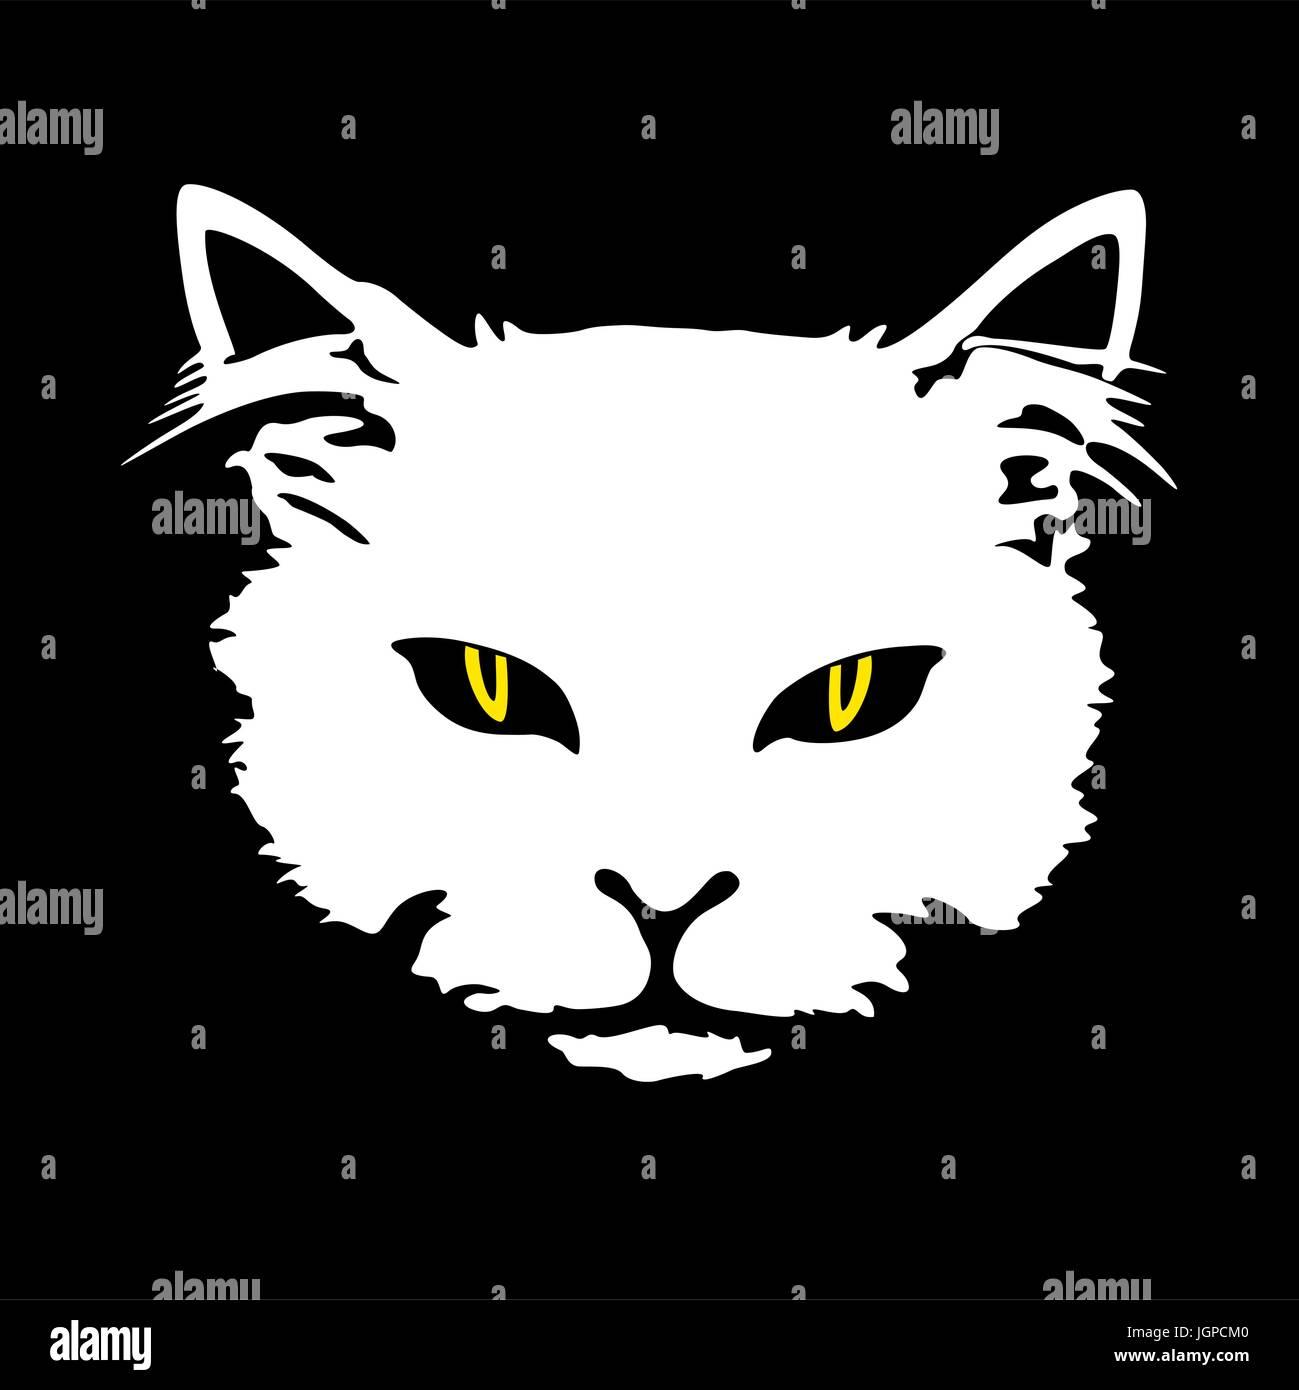 Silhouette Gato Blanco Rostro Con Ojos Amarillos Imprimir Tatuaje